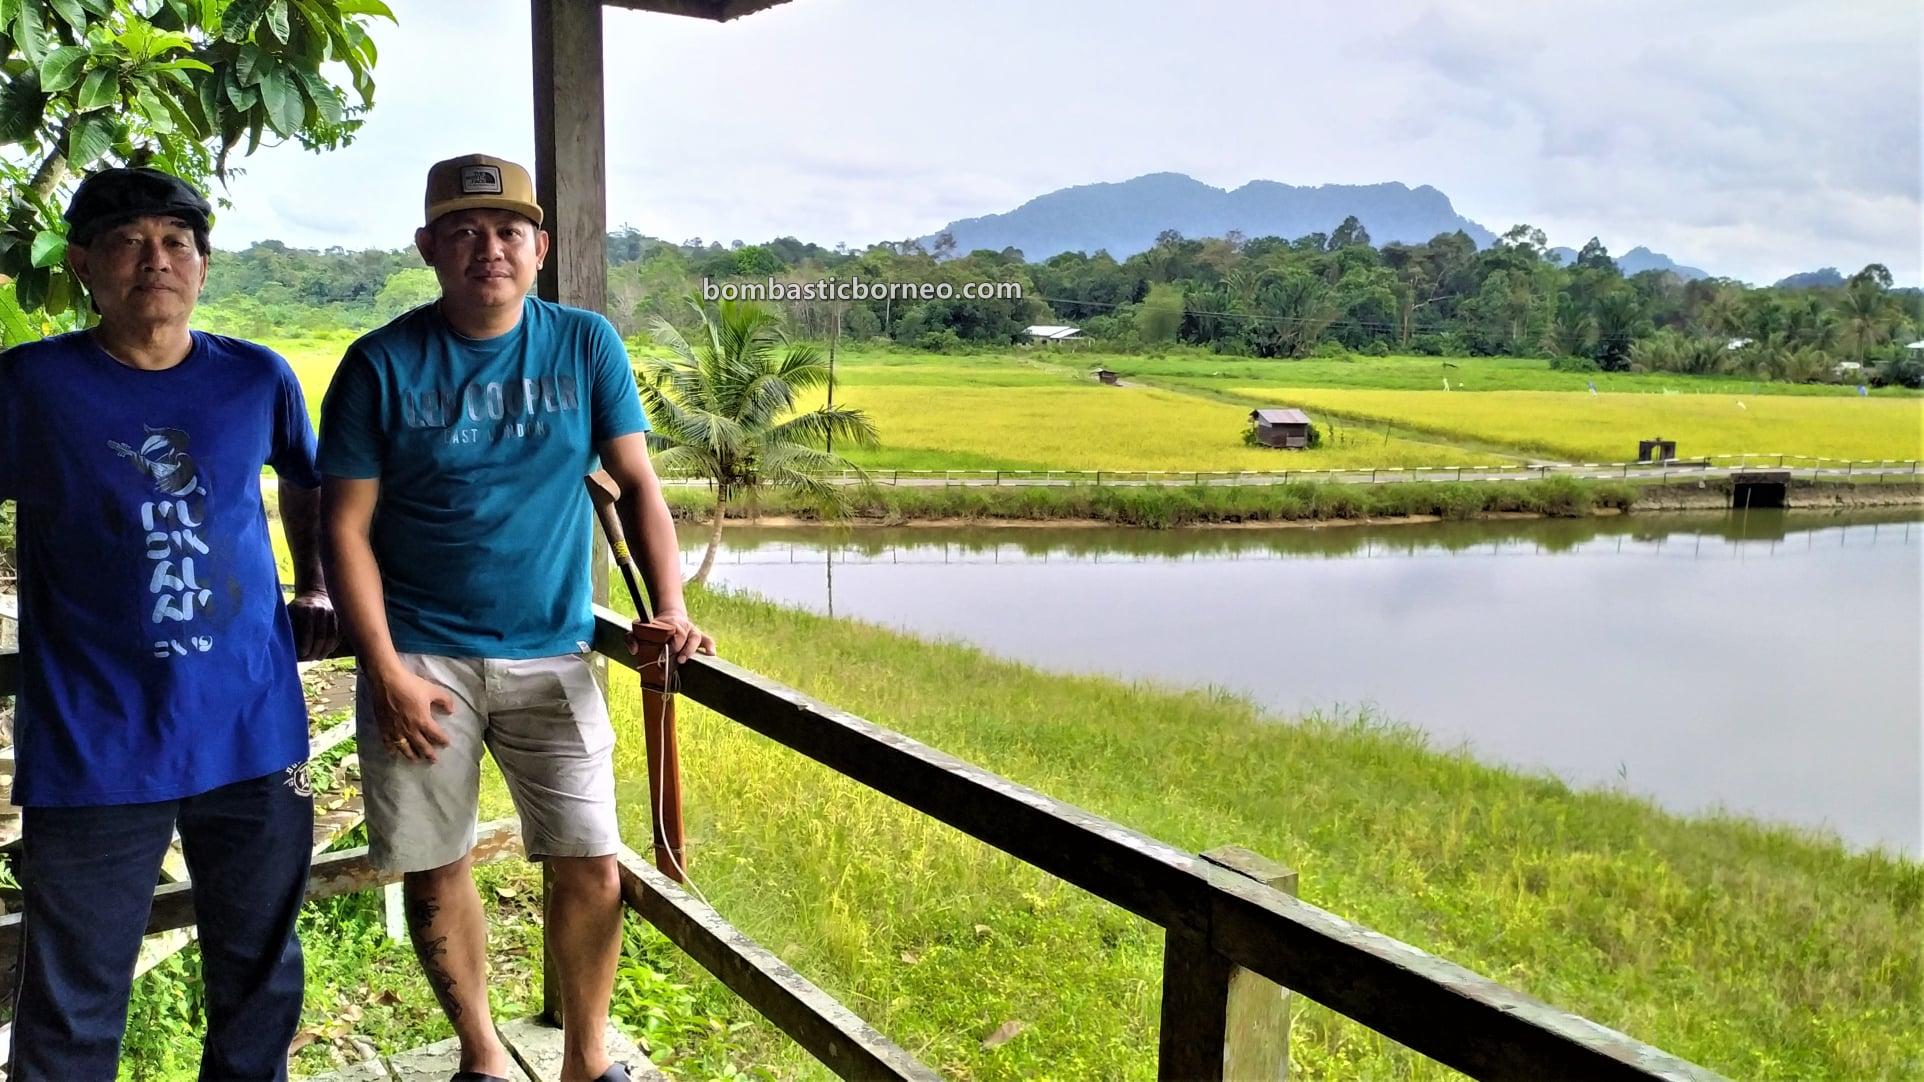 Paddy Field, Dayak Bidayuh village, Siburan, Sarawak, Malaysia, authentic, traditional, nature, ecotourism, travel local, Gua Raya, Borneo, 探索婆罗洲游踪, 砂拉越西连, 马来西亚稻米之乡